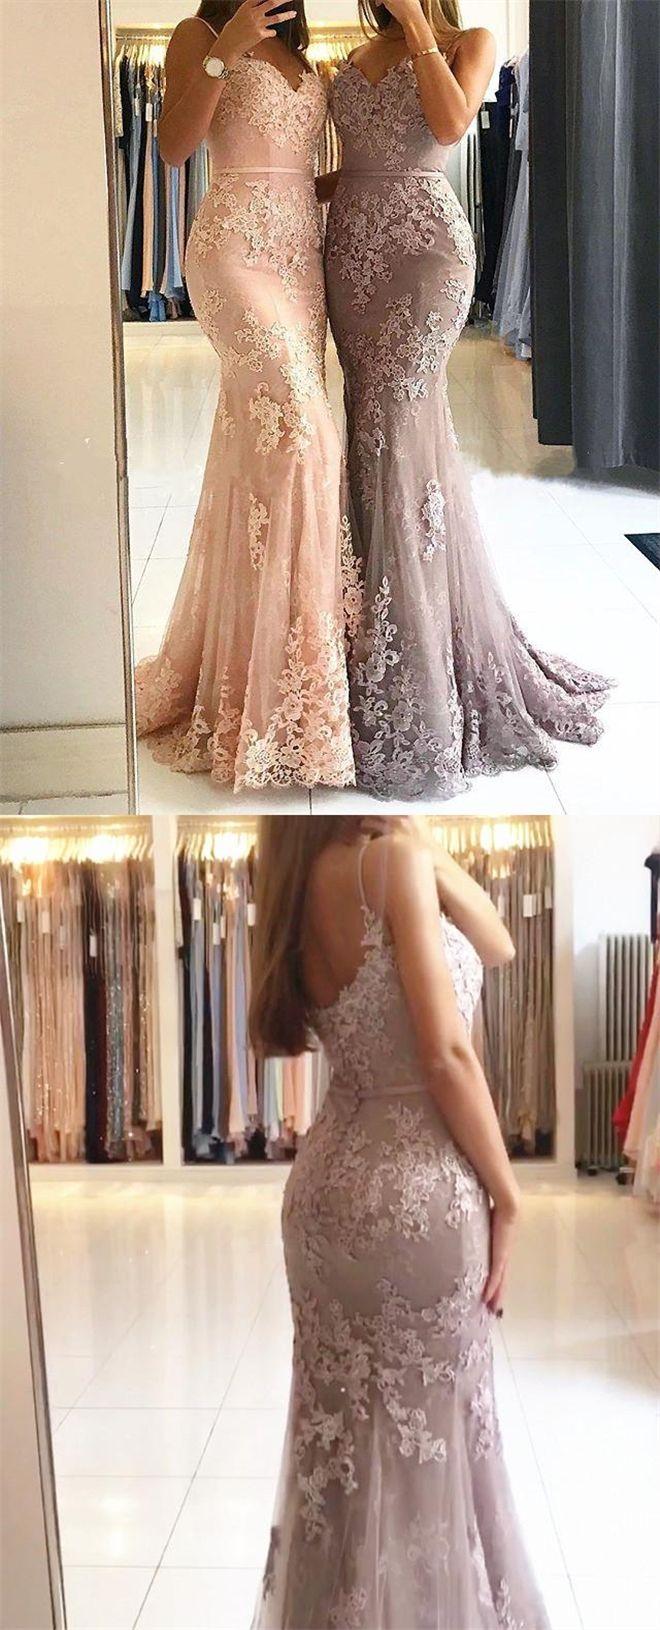 Mermaid spaghetti straps peach prom dress with appliques in